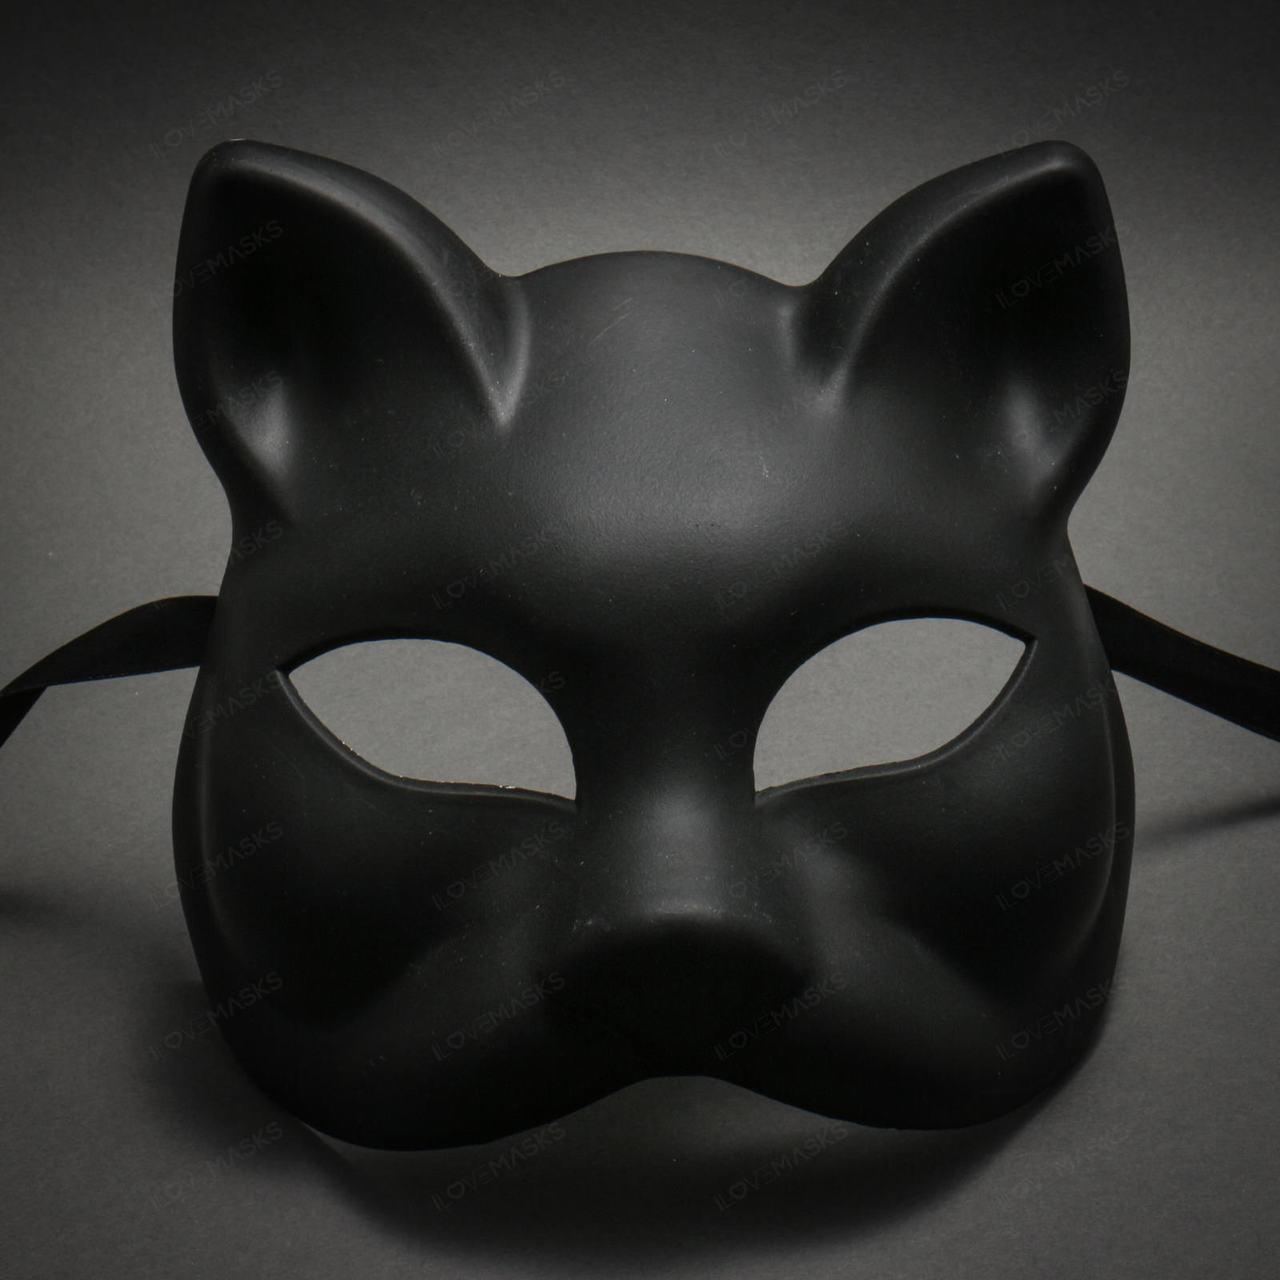 Silver Steampunk Full Face Kitty Halloween Mask Kitty Victorian Mask Ladies/' Kitty Mask